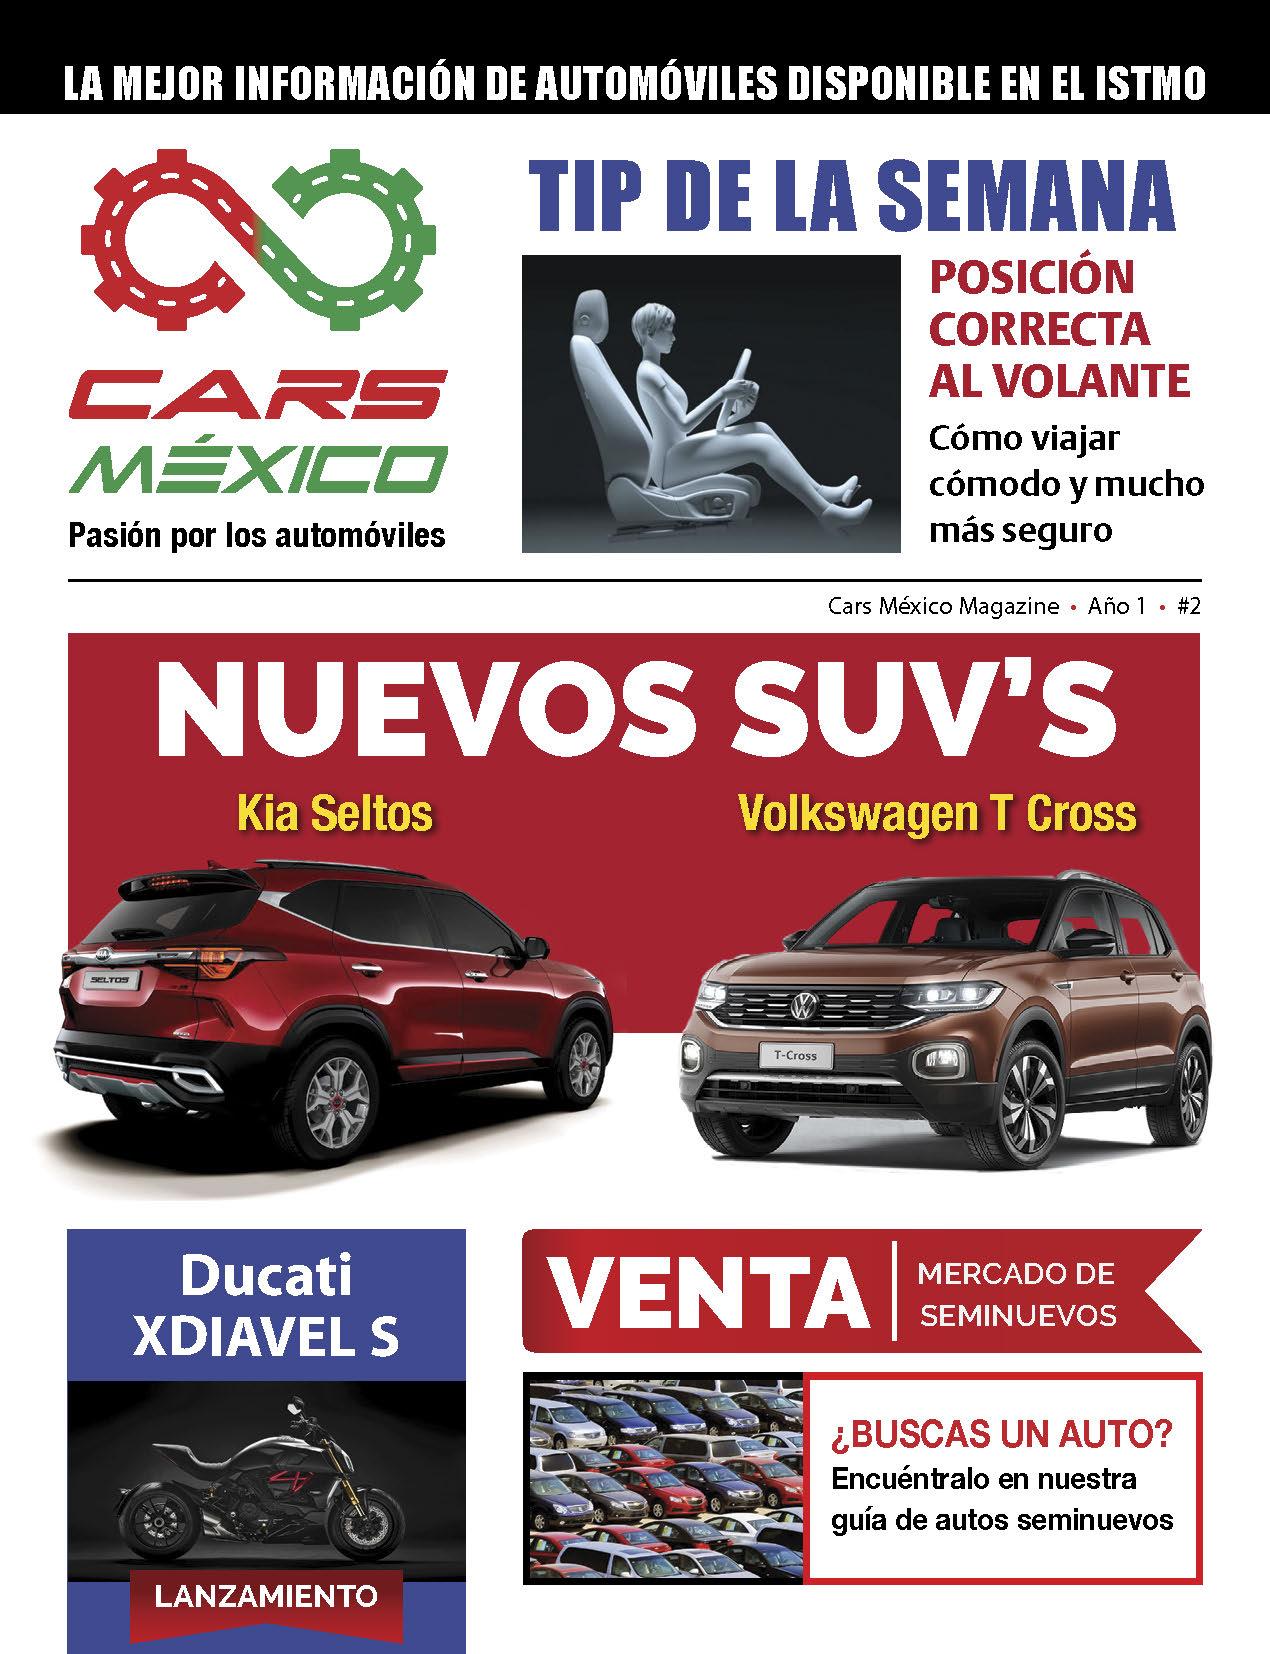 Cars Mexico Magazine